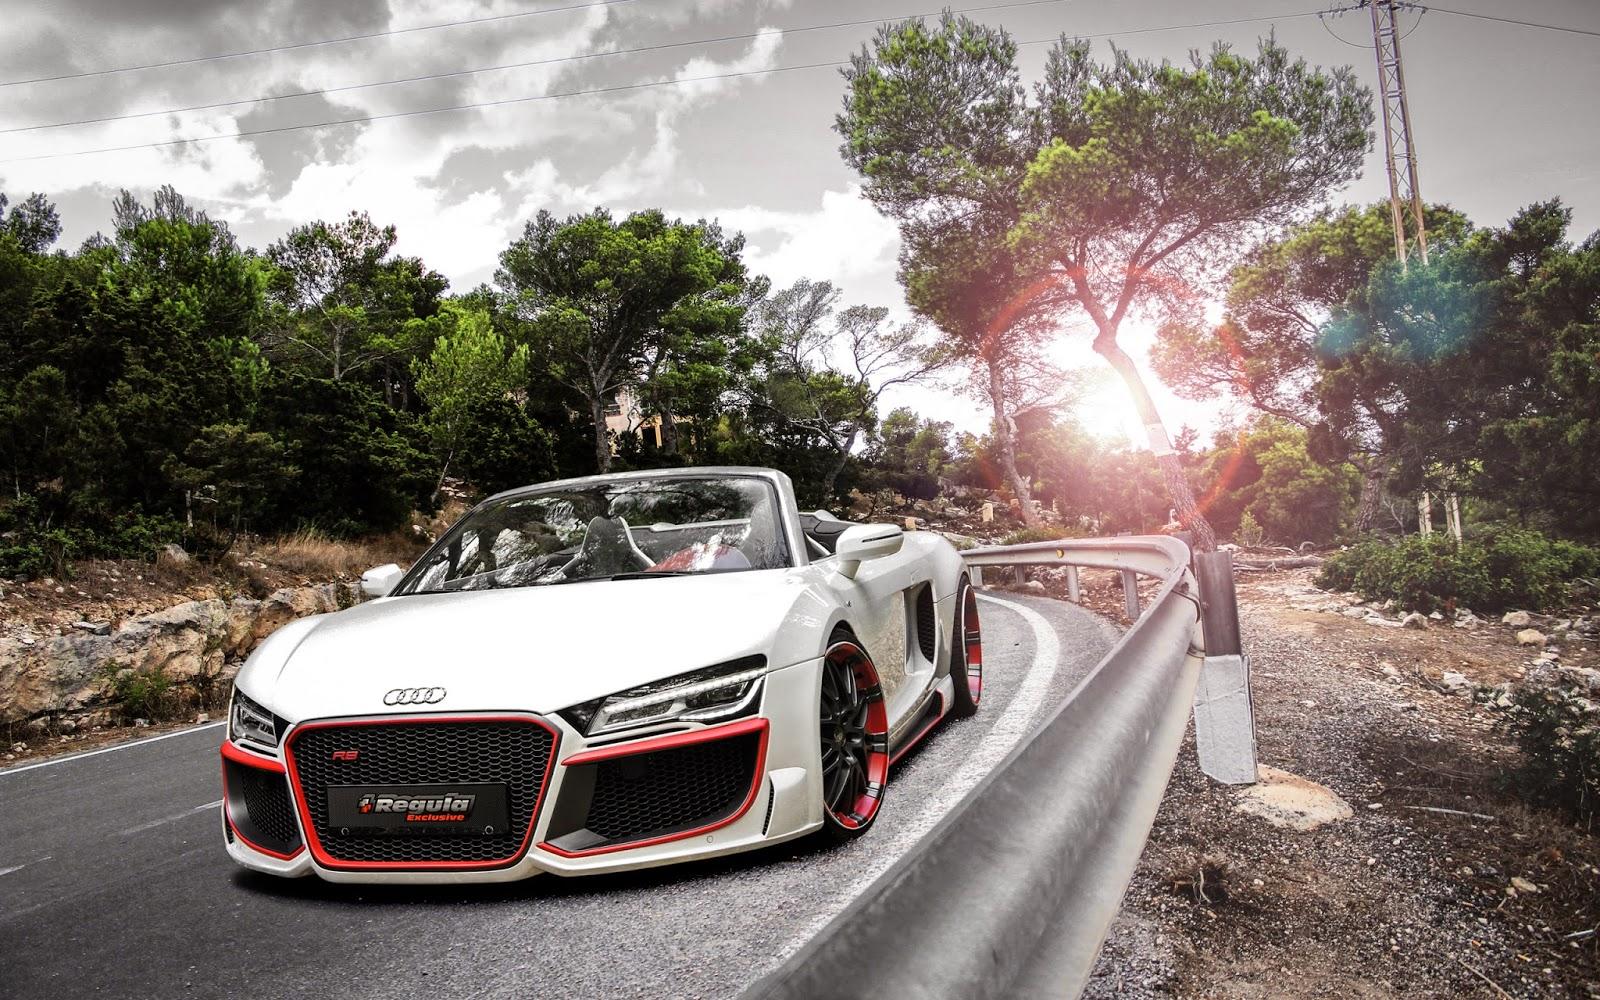 "<img src=""http://2.bp.blogspot.com/-sOyIyQfIu-c/UzXUETcK6qI/AAAAAAAALPk/dWDYdFJkV_I/s1600/2014-audi-spyder-wallpaper.jpg"" alt=""Audi Wallpapers"" />"